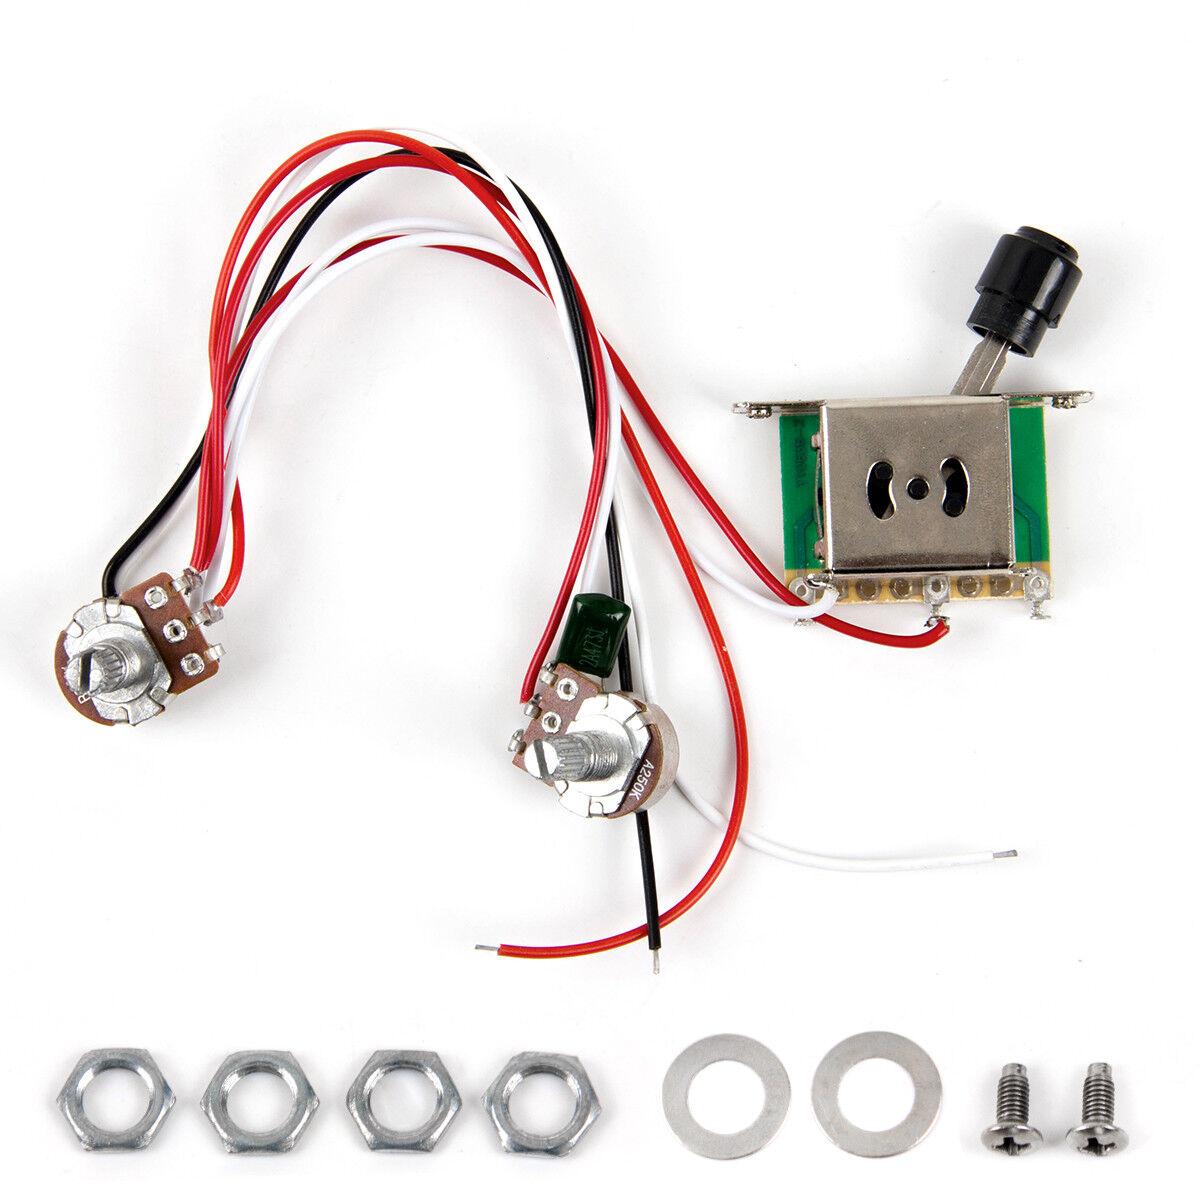 Tele Wiring Harness - Data Wiring Diagram Site on tele body, tele mirrors, tele bass,